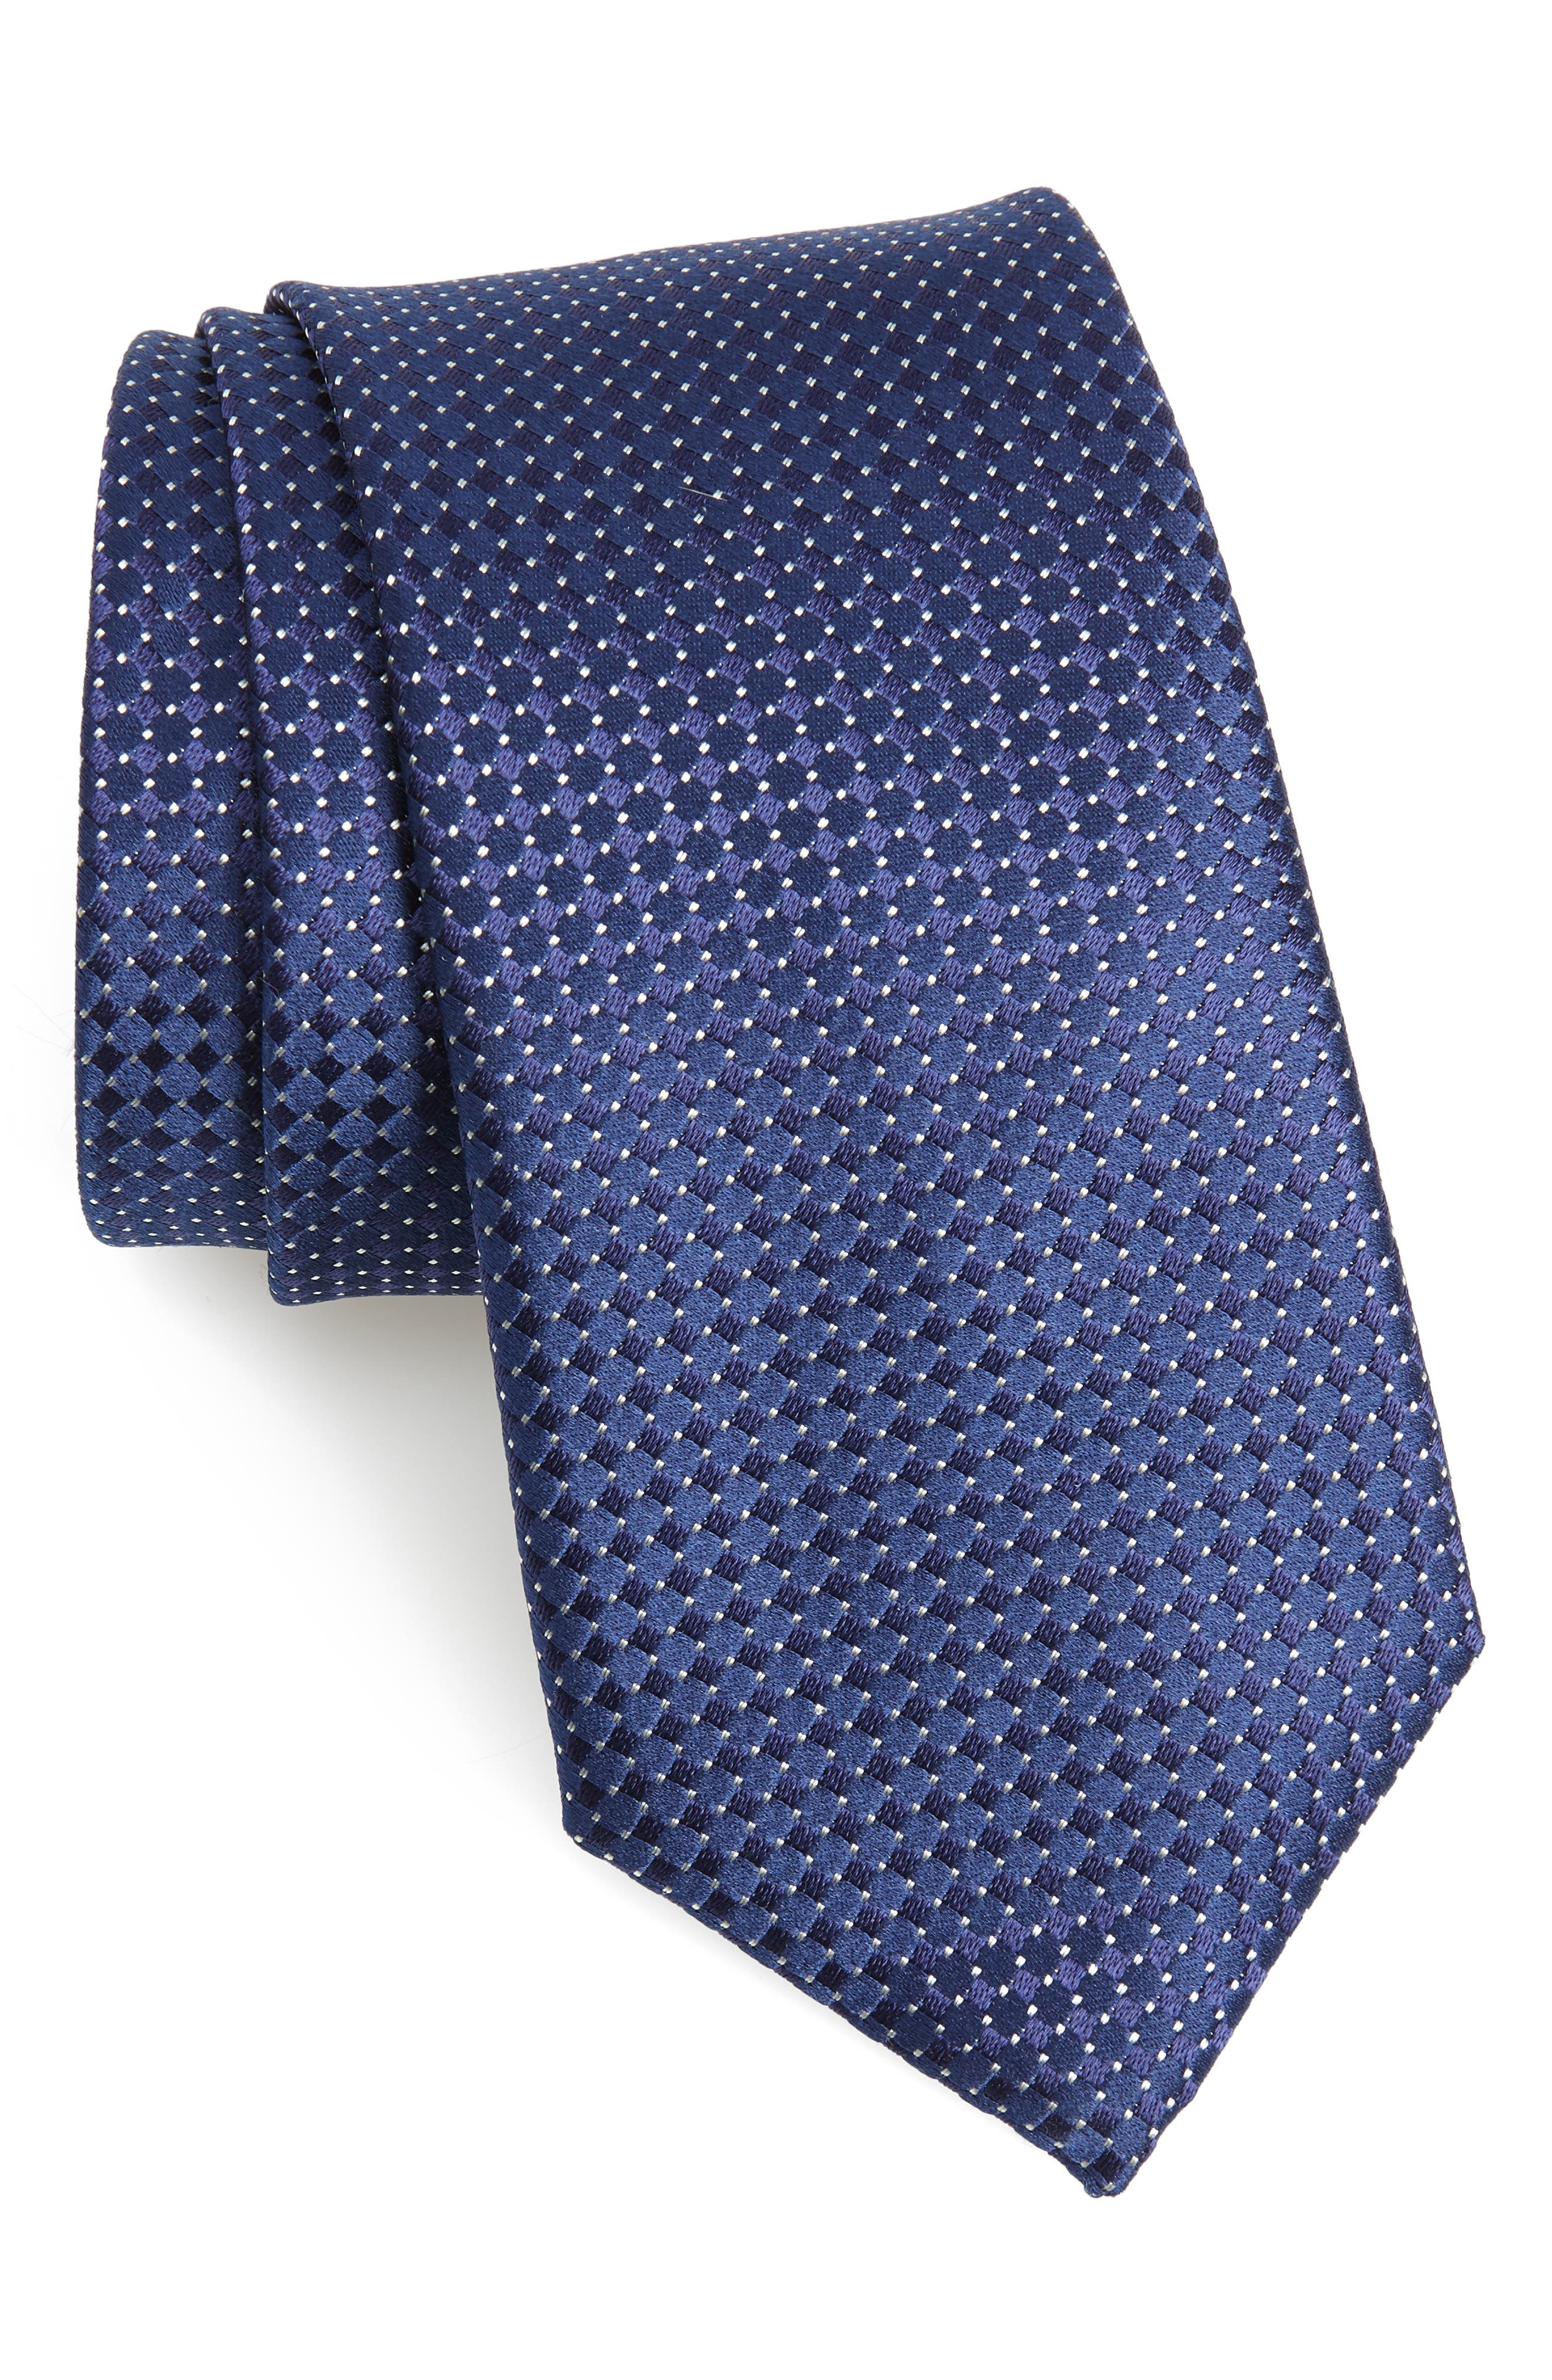 Neat Silk Tie,                             Main thumbnail 1, color,                             NAVY